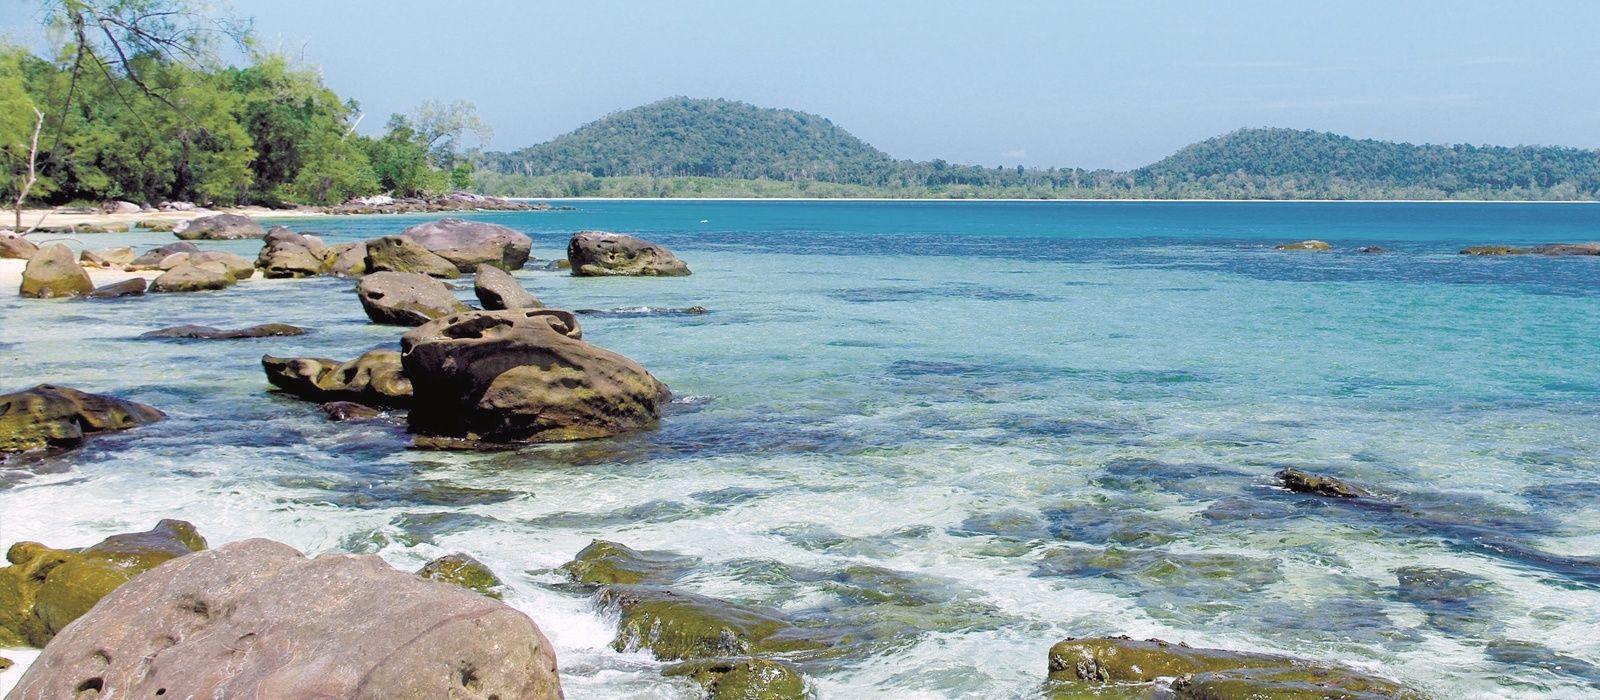 Destination Sihanoukville Cambodia